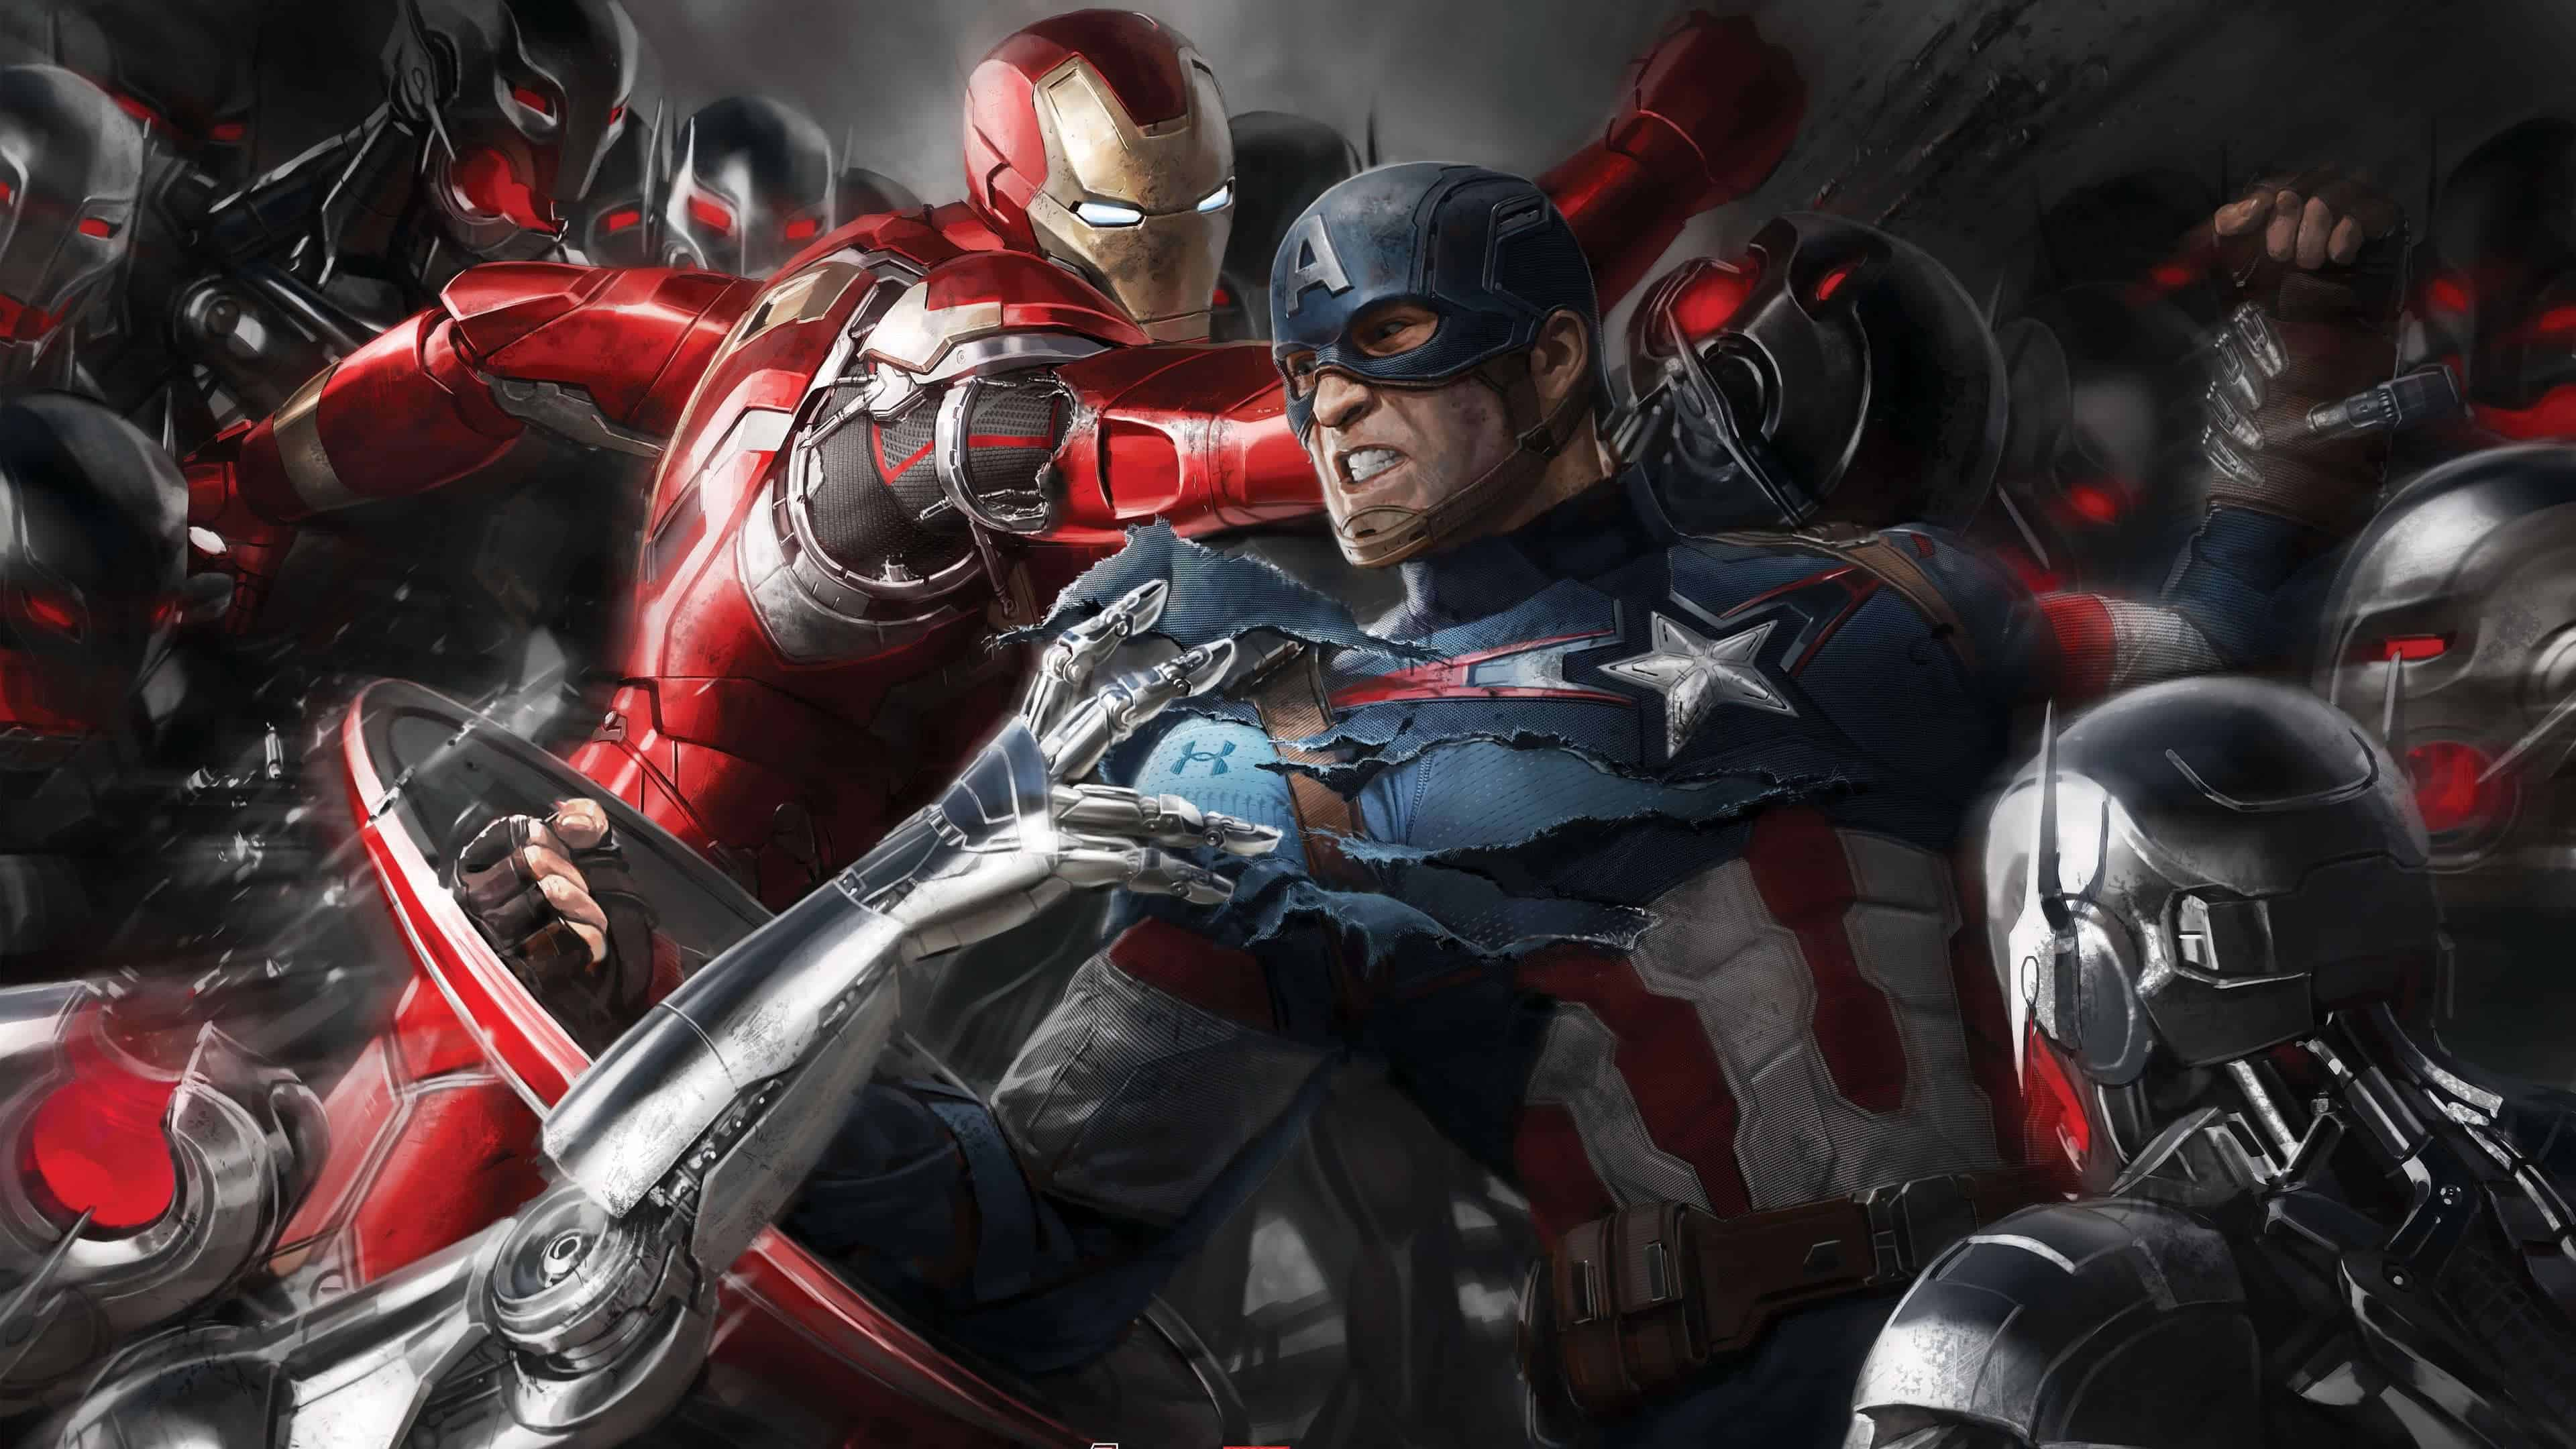 Tony Stark Hd Wallpapers Captain America And Iron Man Civil War Uhd 4k Wallpaper